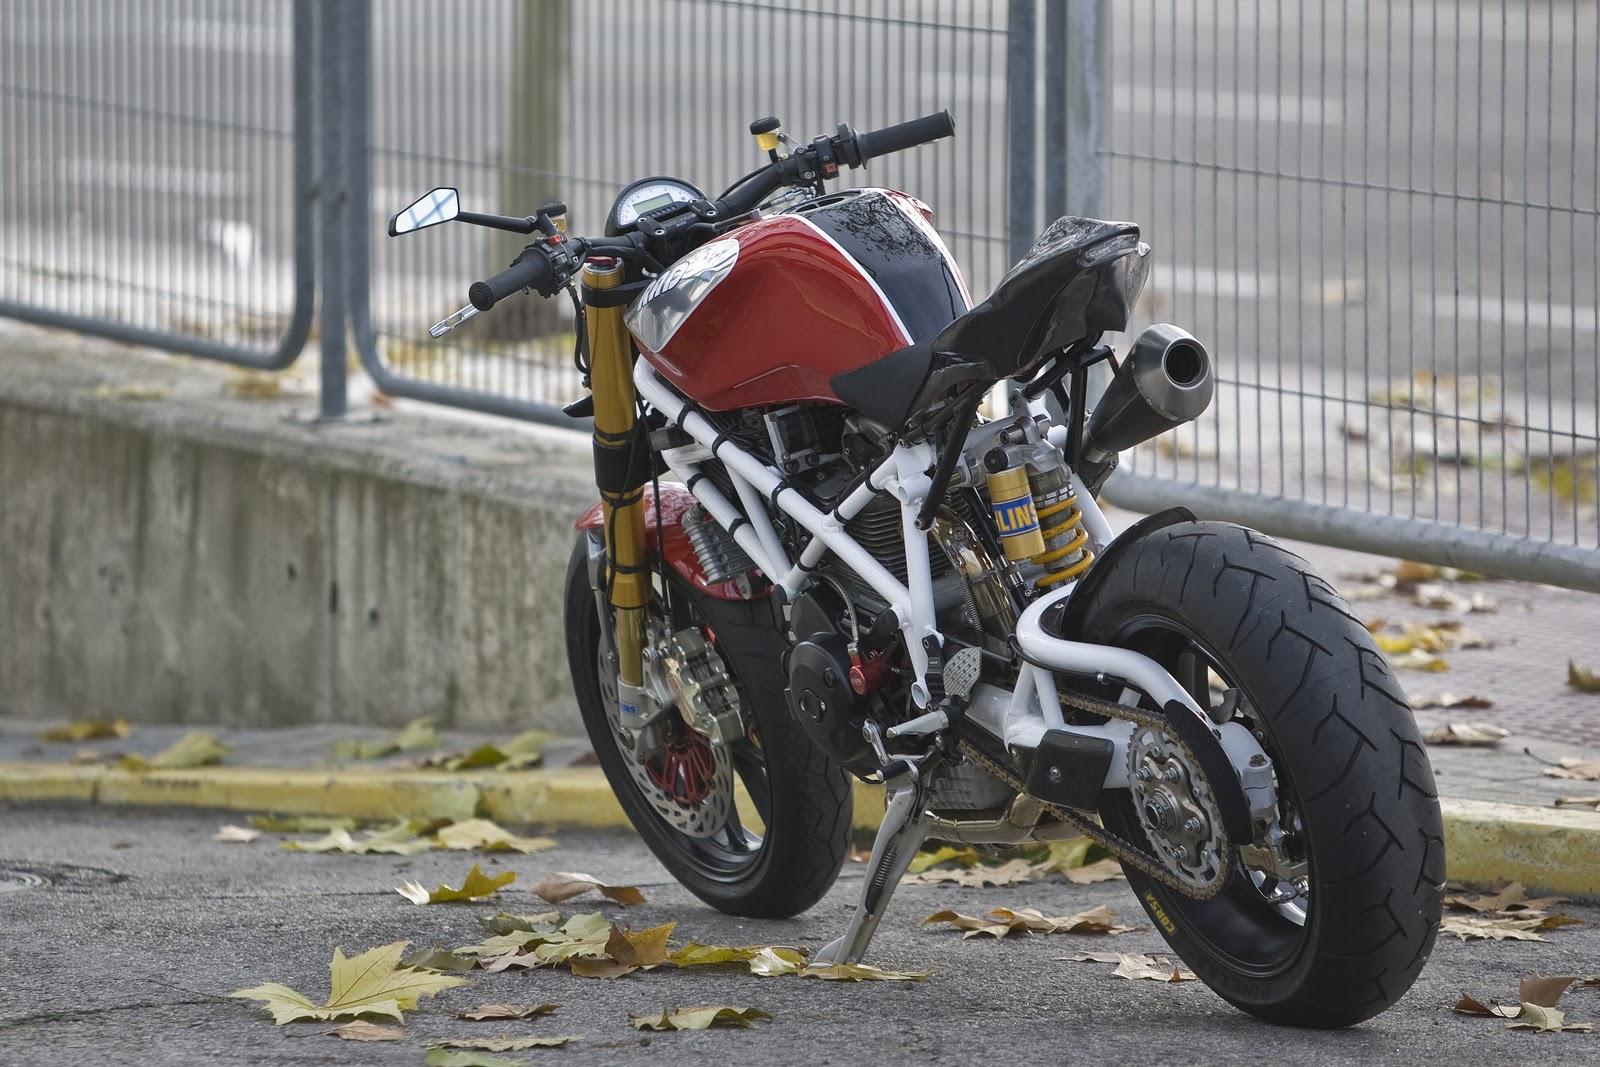 Rad02 Pursang By Radical Ducati Rocketgarage Cafe